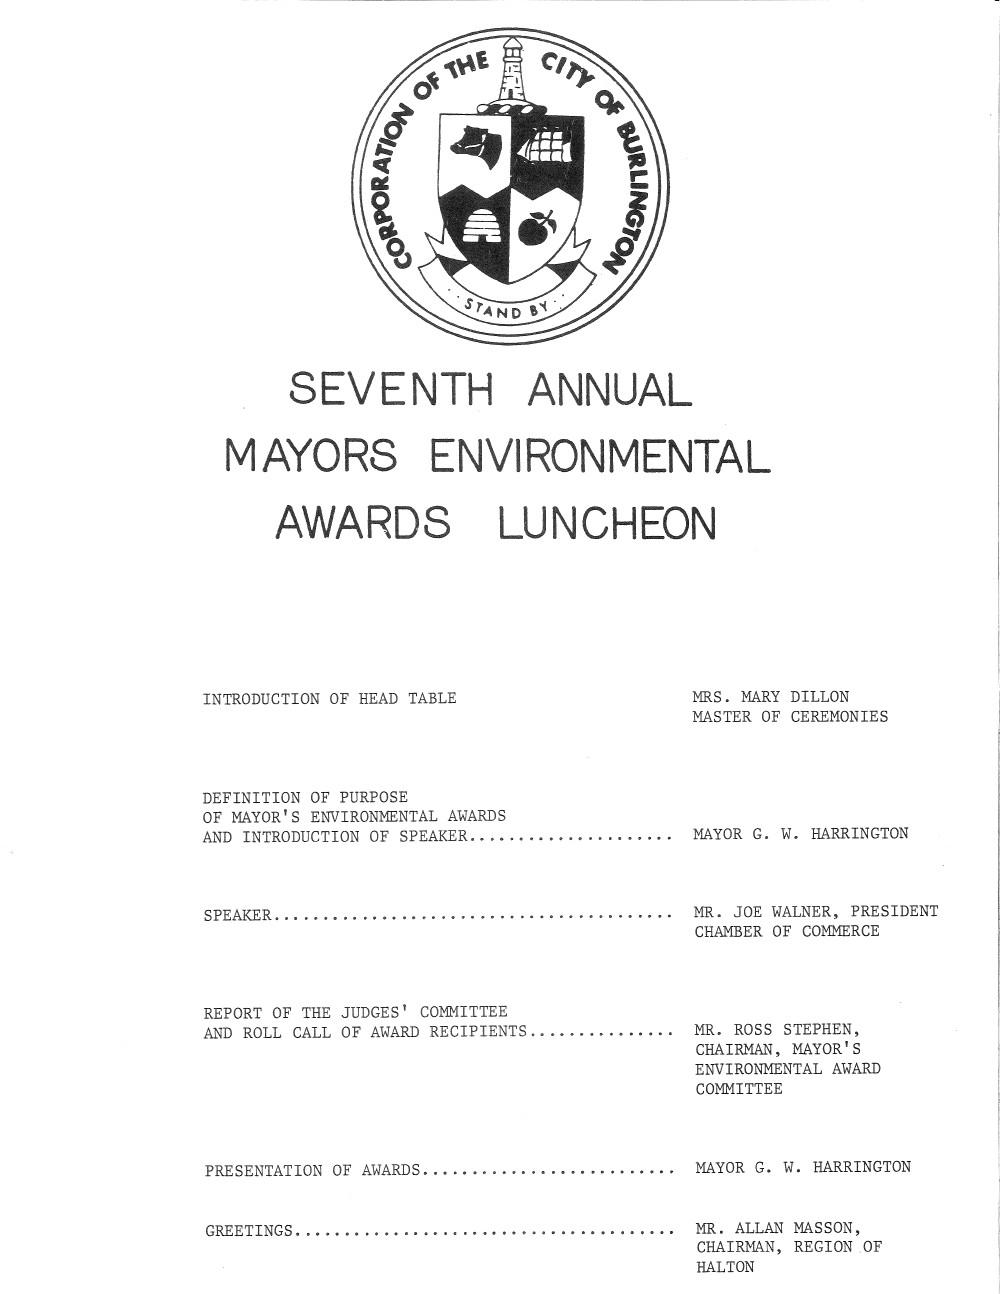 Mayor's Environmental Award Programme, Seventh Annual Awards, City of Burlington